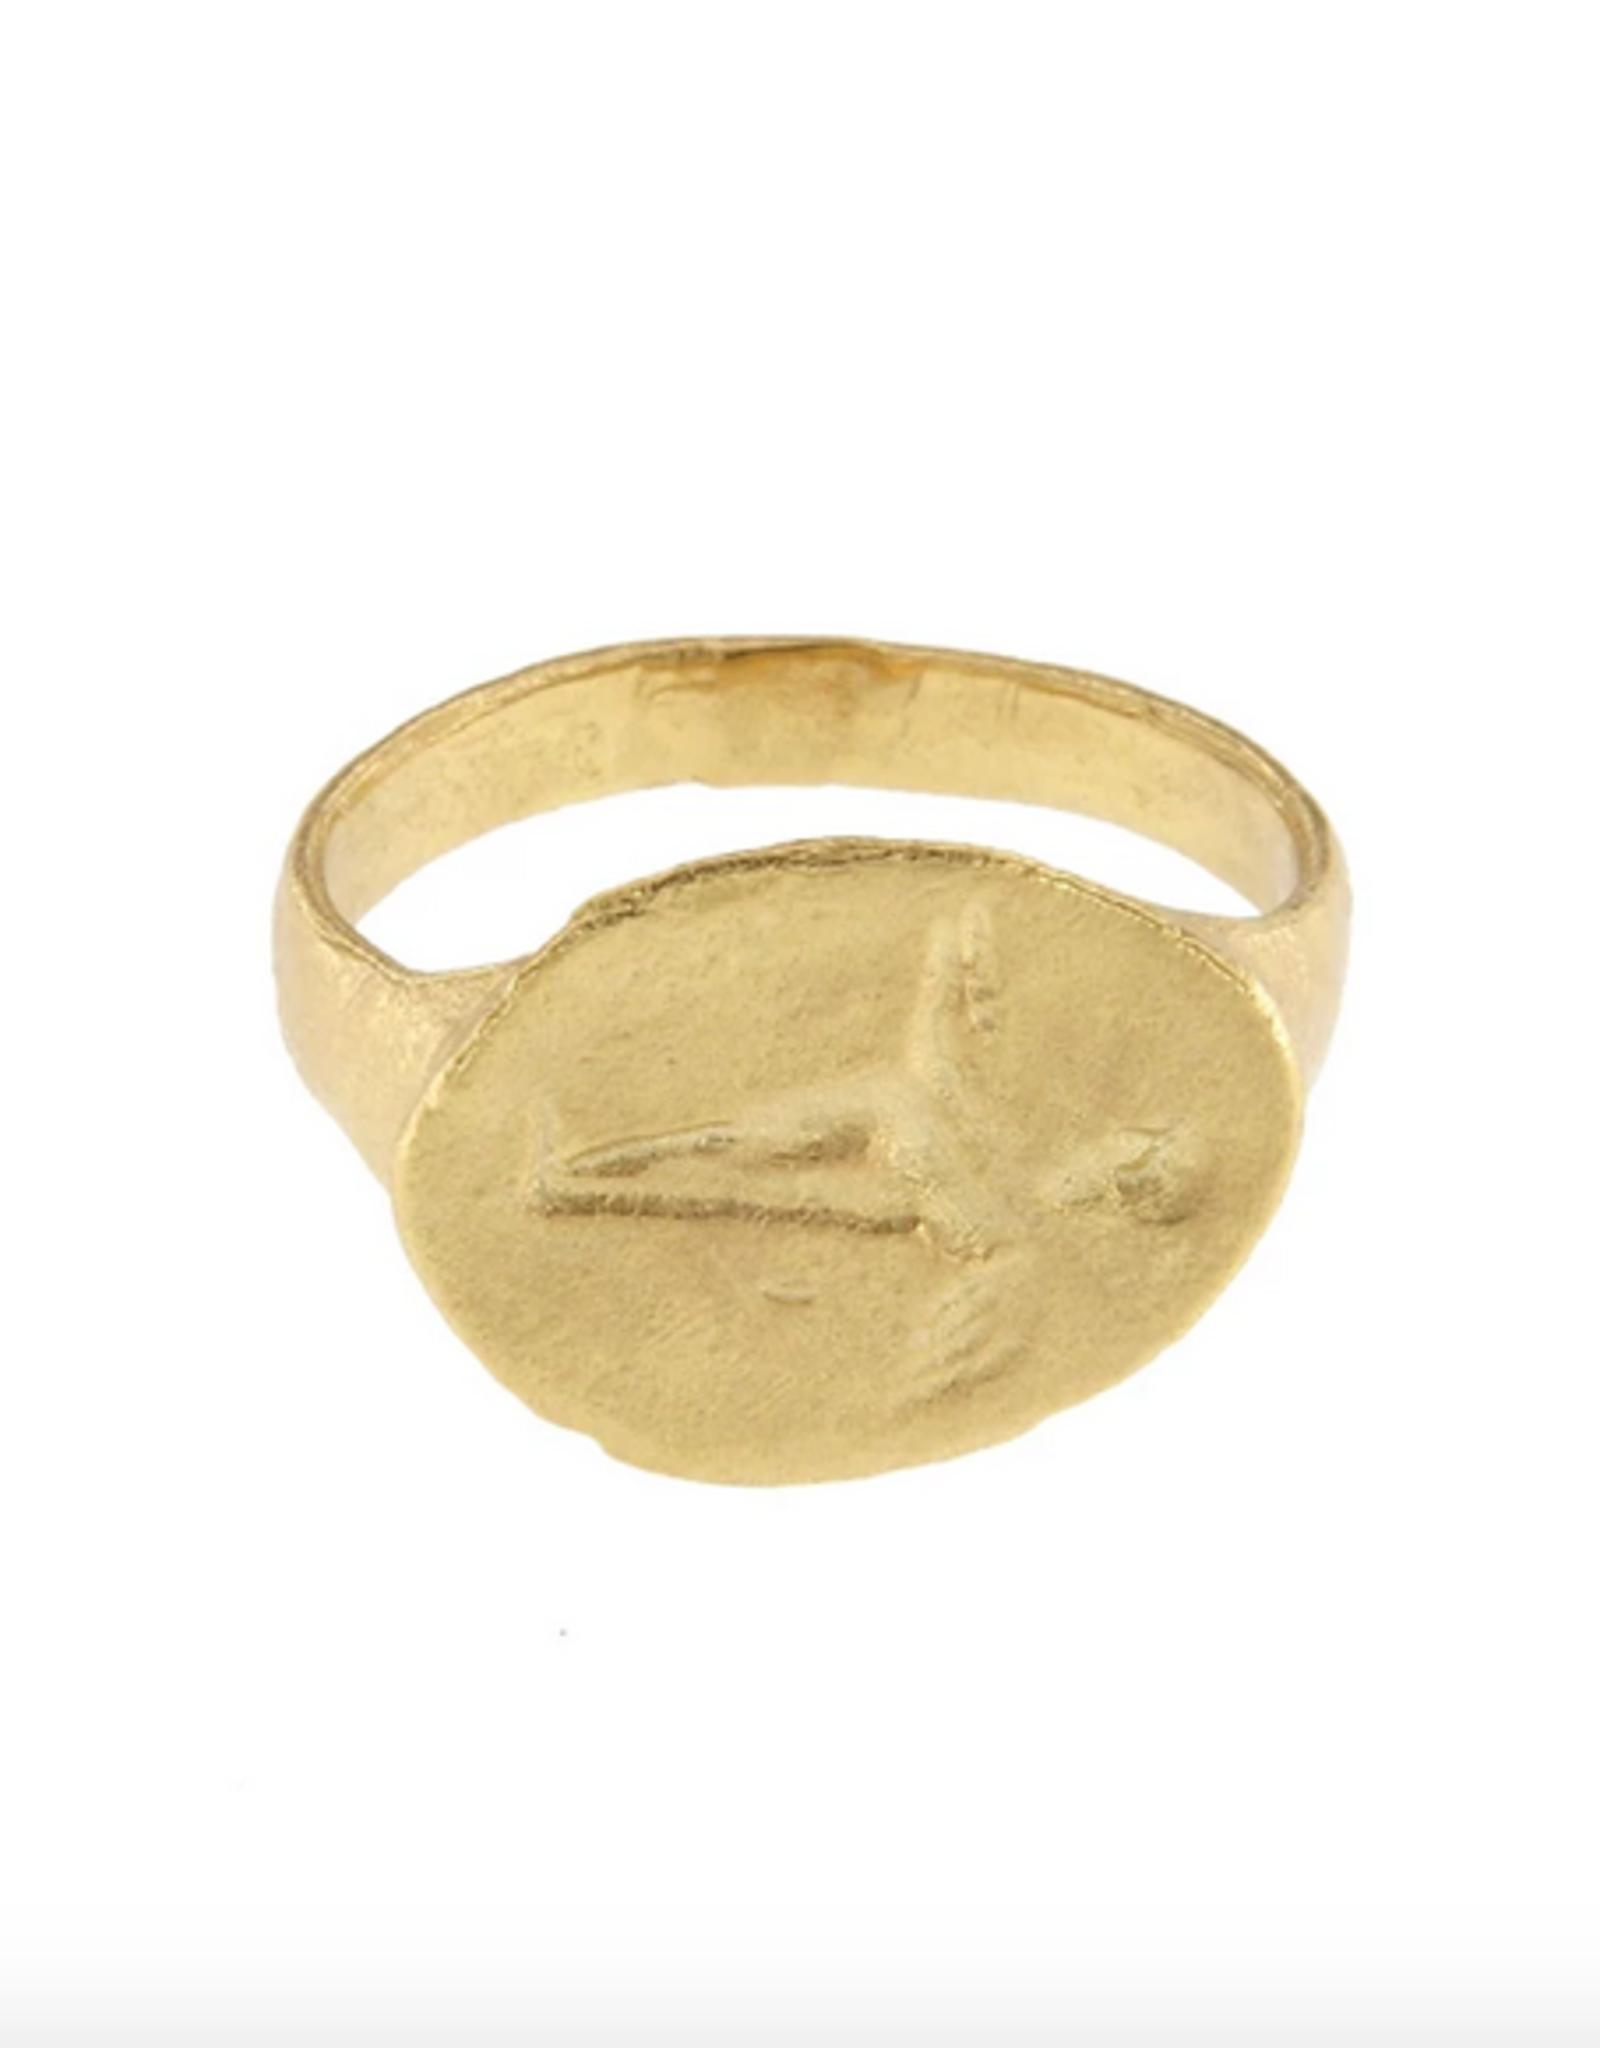 Cleopatra's Bling Cleopatra's bling Peristera gold